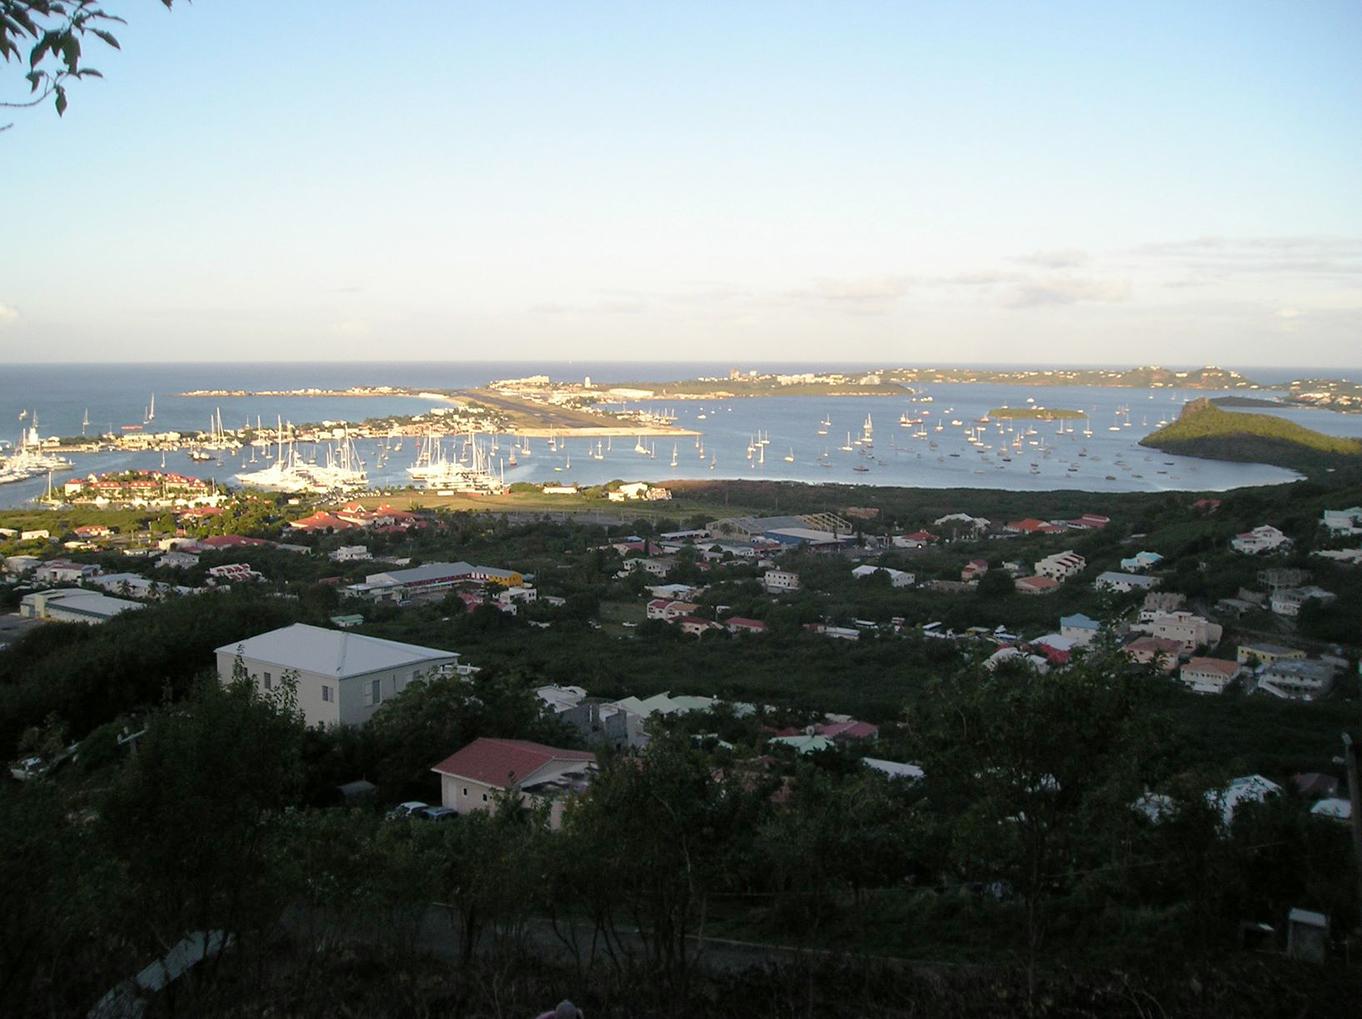 Hillside Development Land